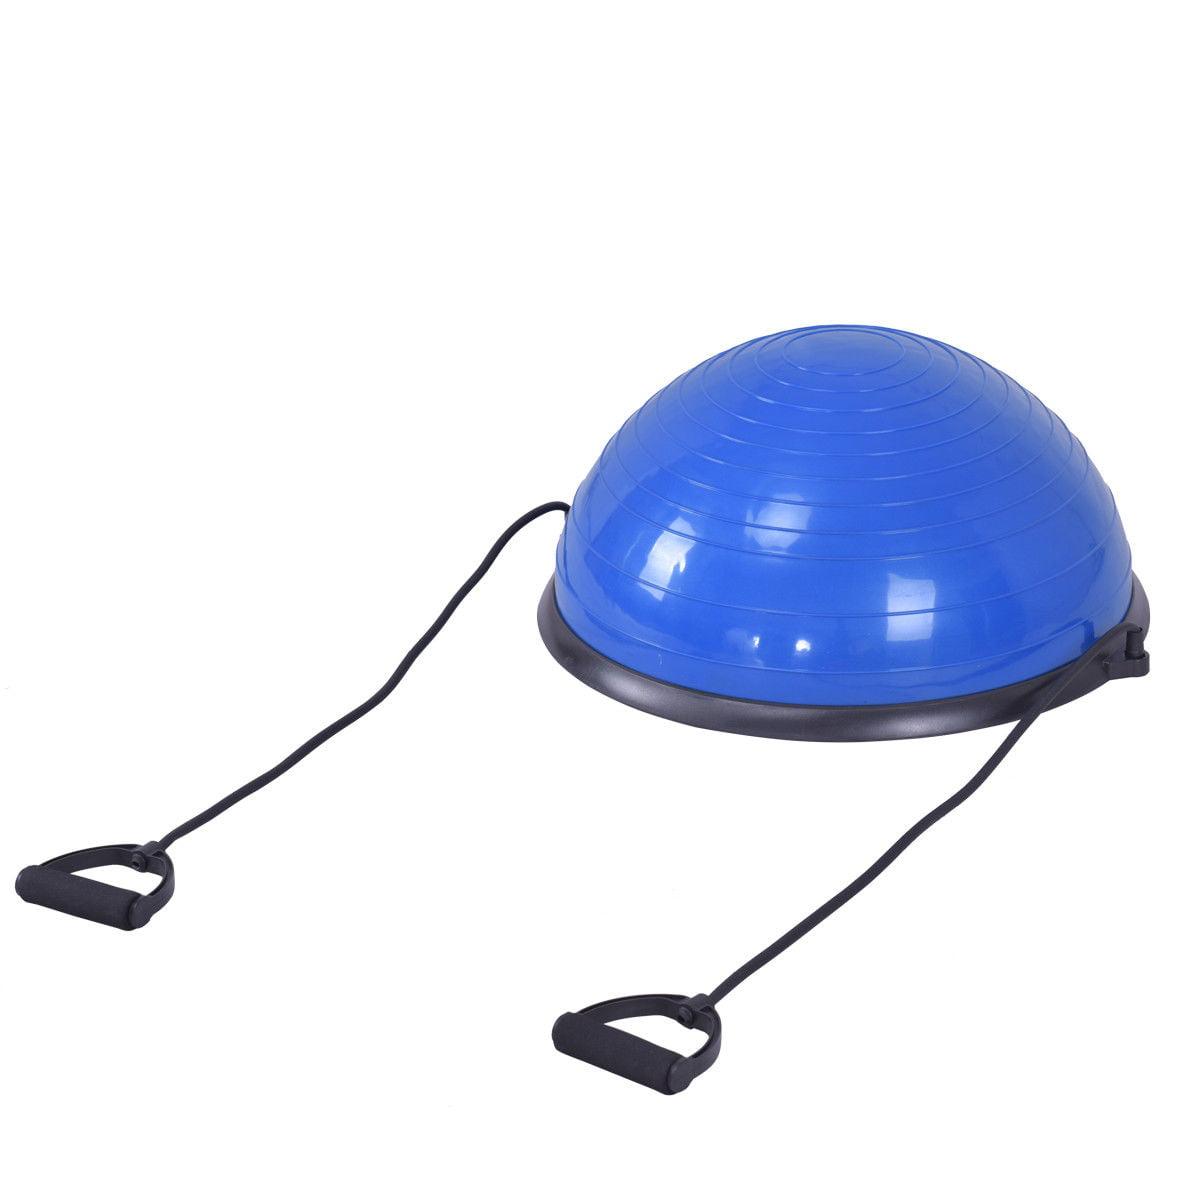 "23"" Blue Yoga Ball Balance Trainer w/ Pump Home Exercise Training Fitness - image 6 de 8"